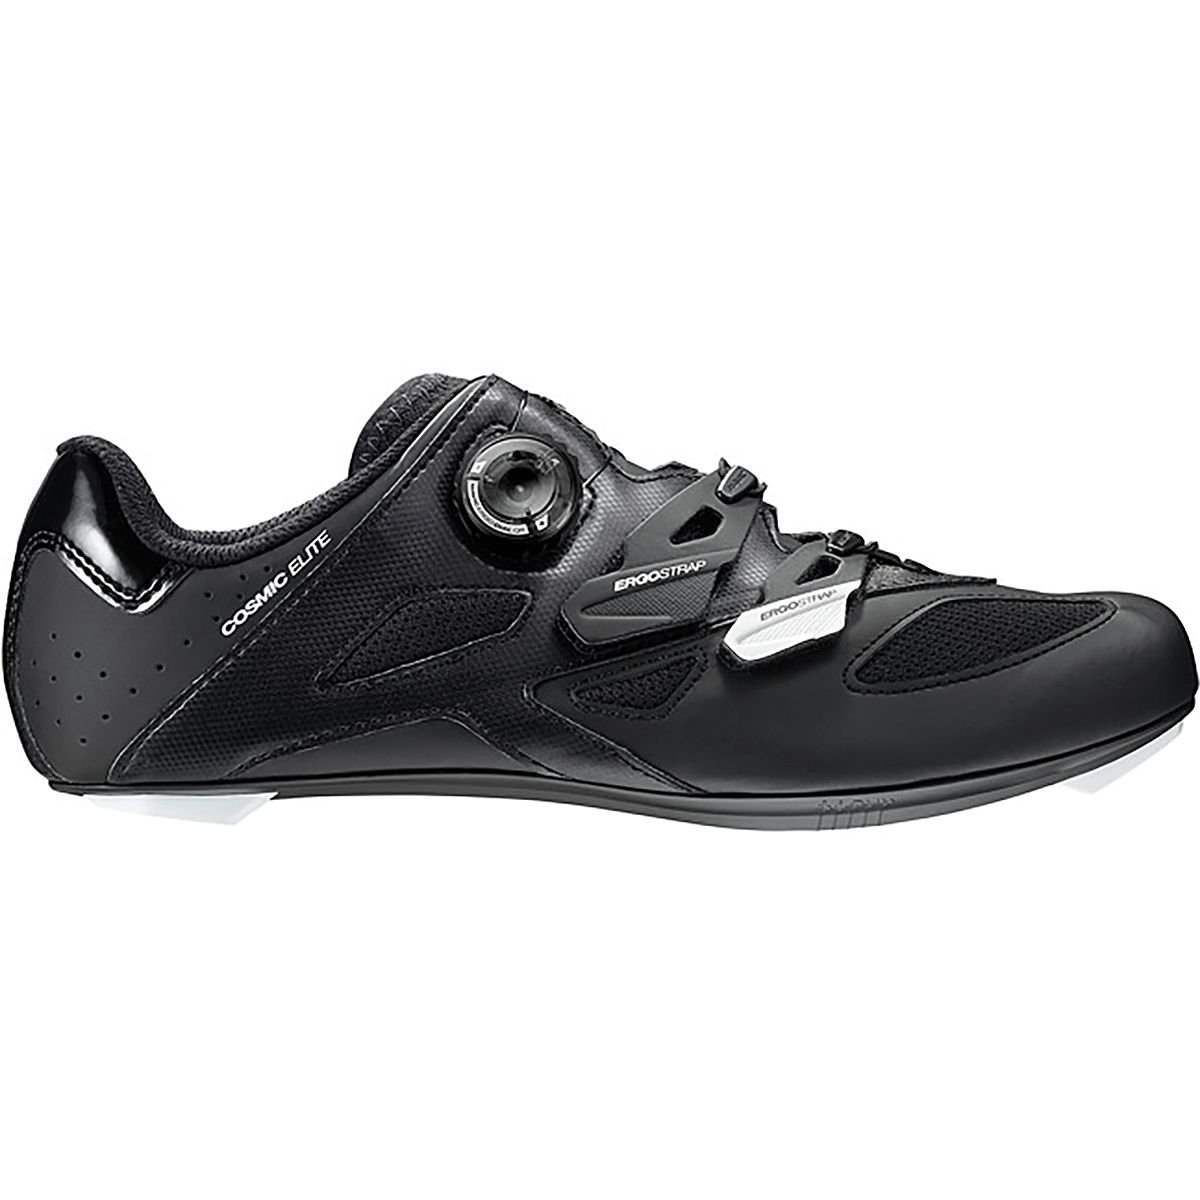 Mavic Cosmic Elite Cycling Shoes - Men's B01LYVQAYM 11 UK/11.5 US Black/White/Black